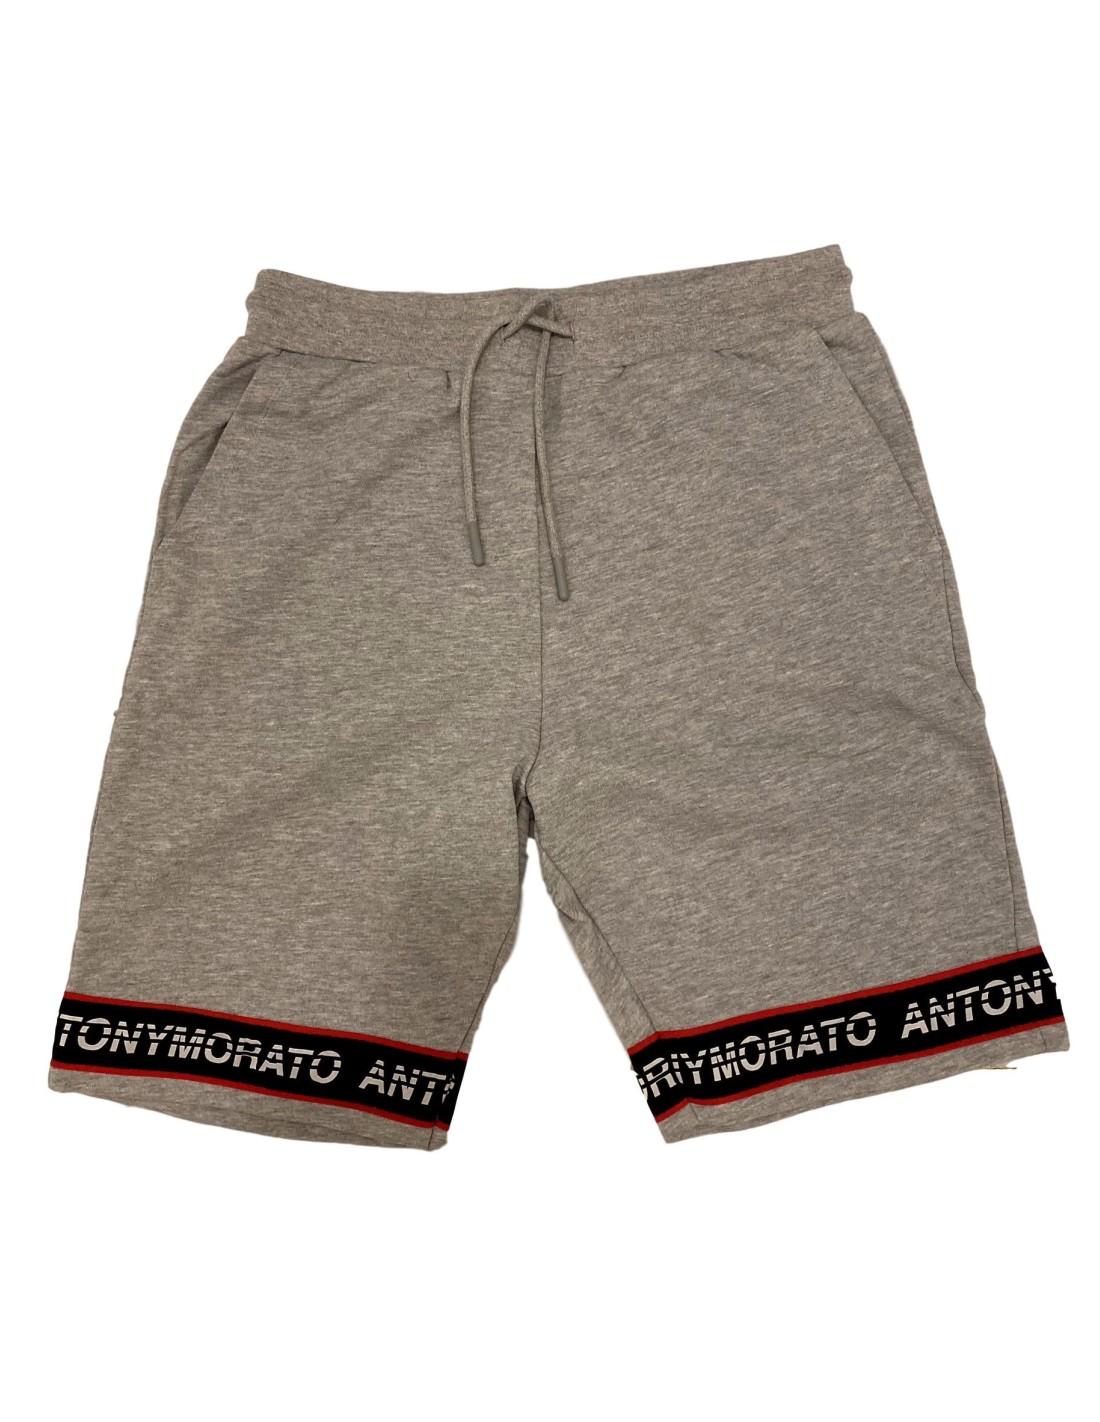 Pantalon Corto Antony Morato Gris Con Elastico Y Logo